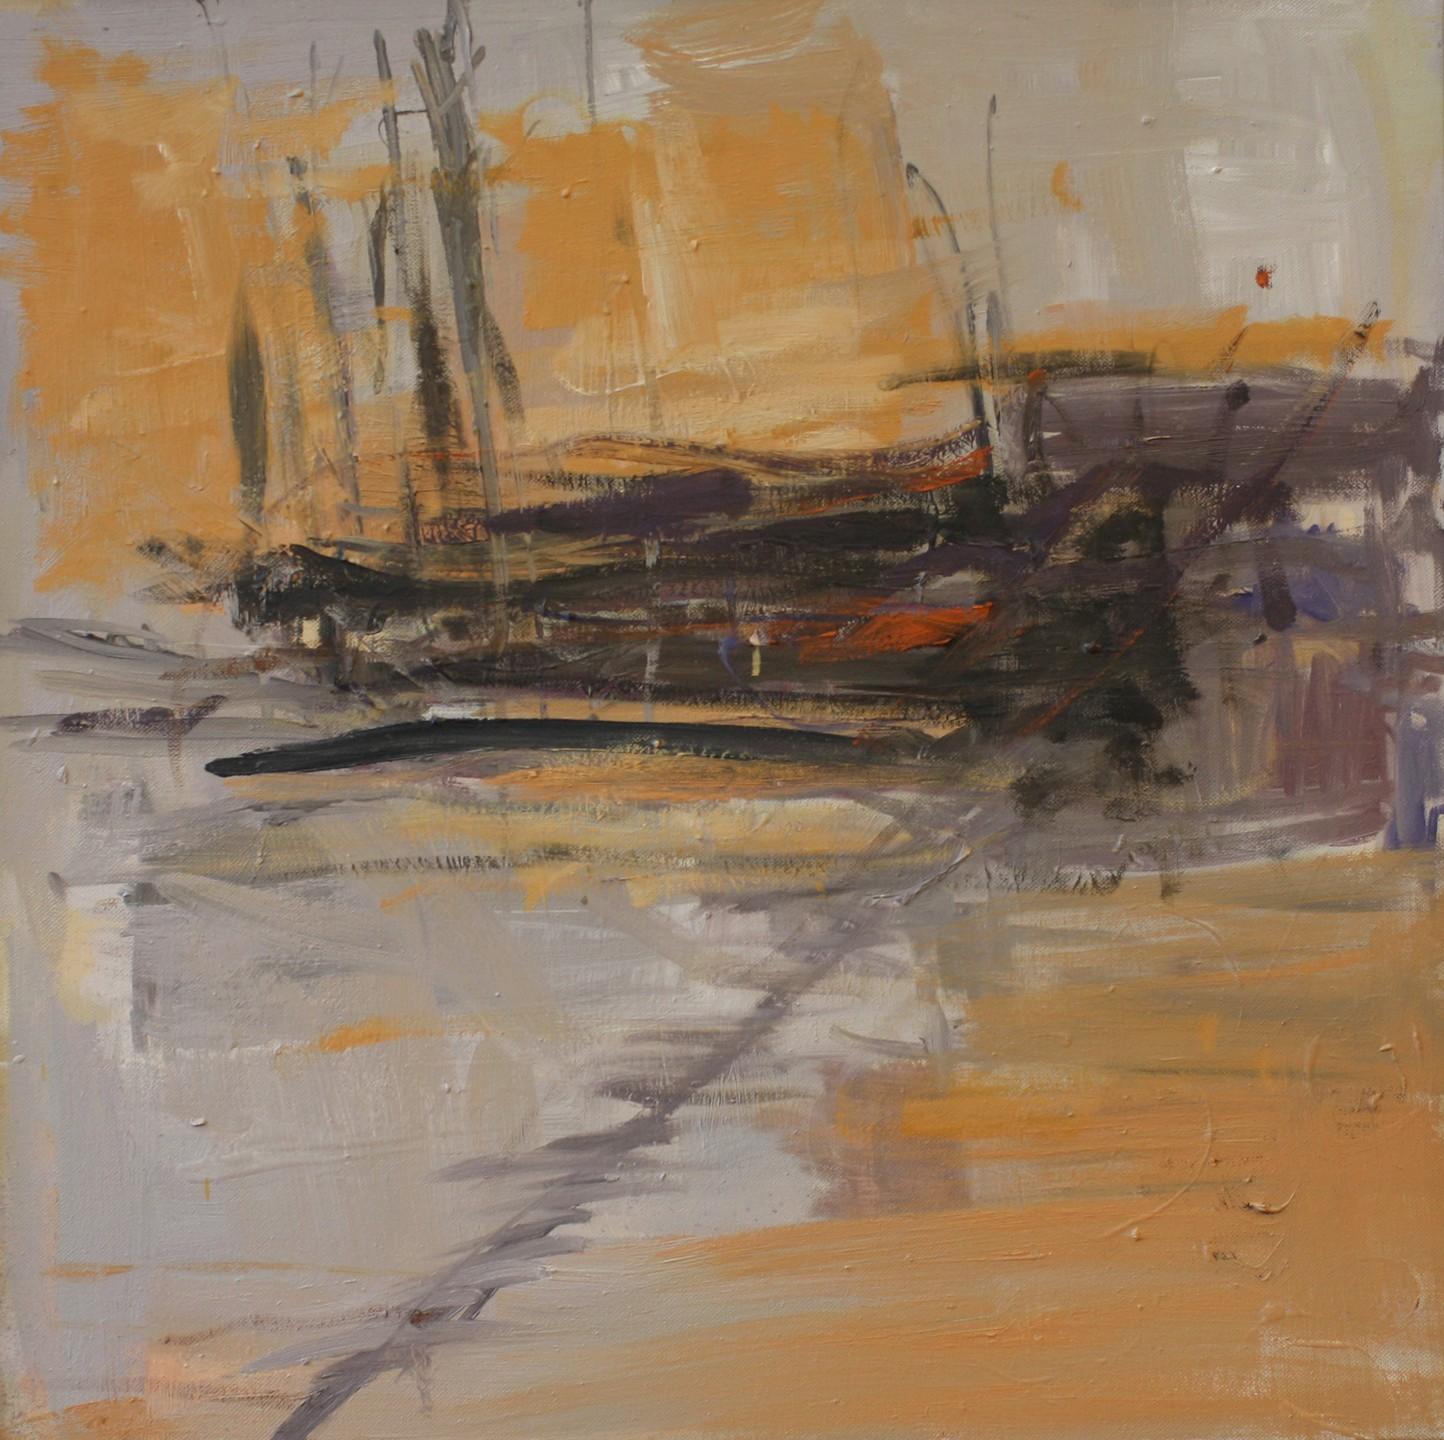 Painting_46_Olmec Horizon,oil on canvas, 24 x 24 in.JPG